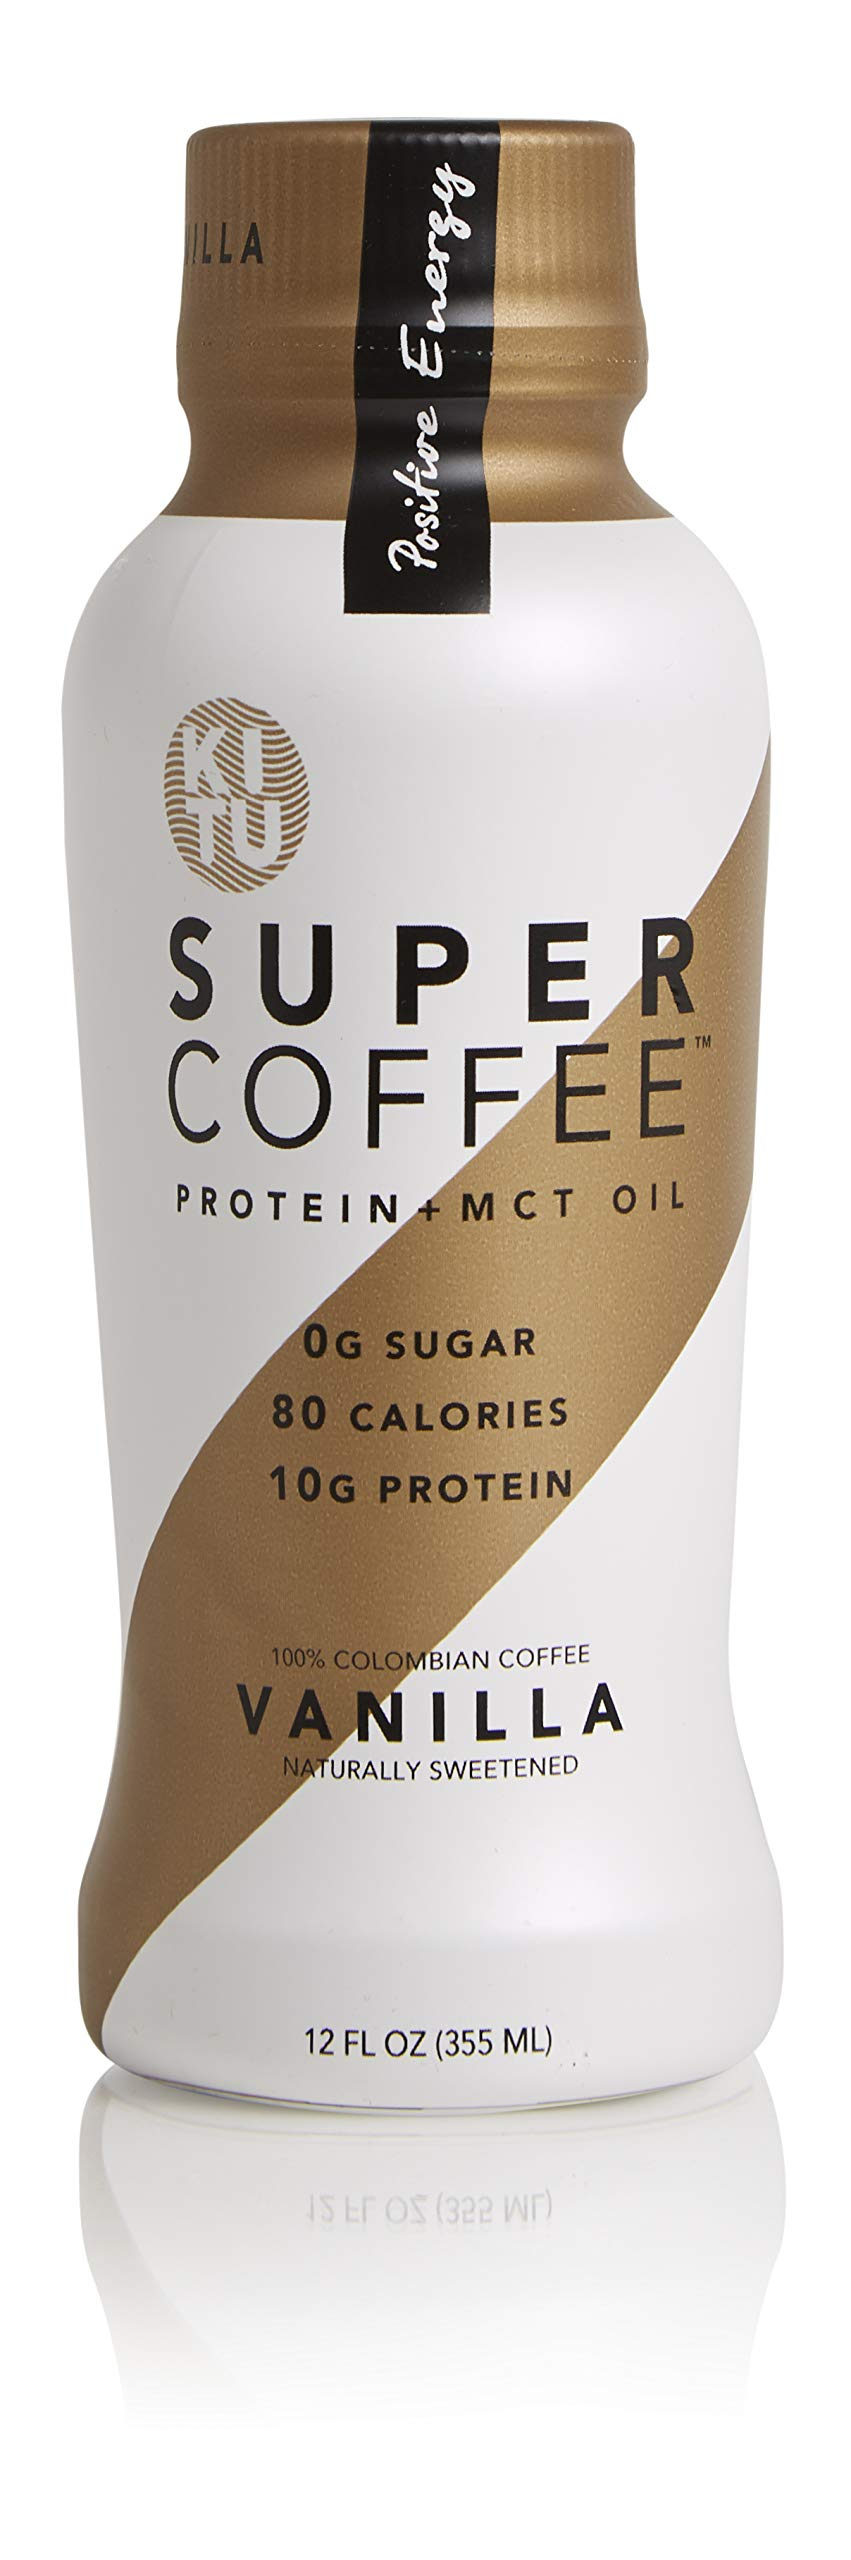 Kitu by Sunniva Super Coffee Vanilla Sugar-Free Formula, 10g Protein, Keto Approved, Lactose Free, Soy Free, Gluten Free, Pack of 24 by SUNNIVA SUPER COFFEE